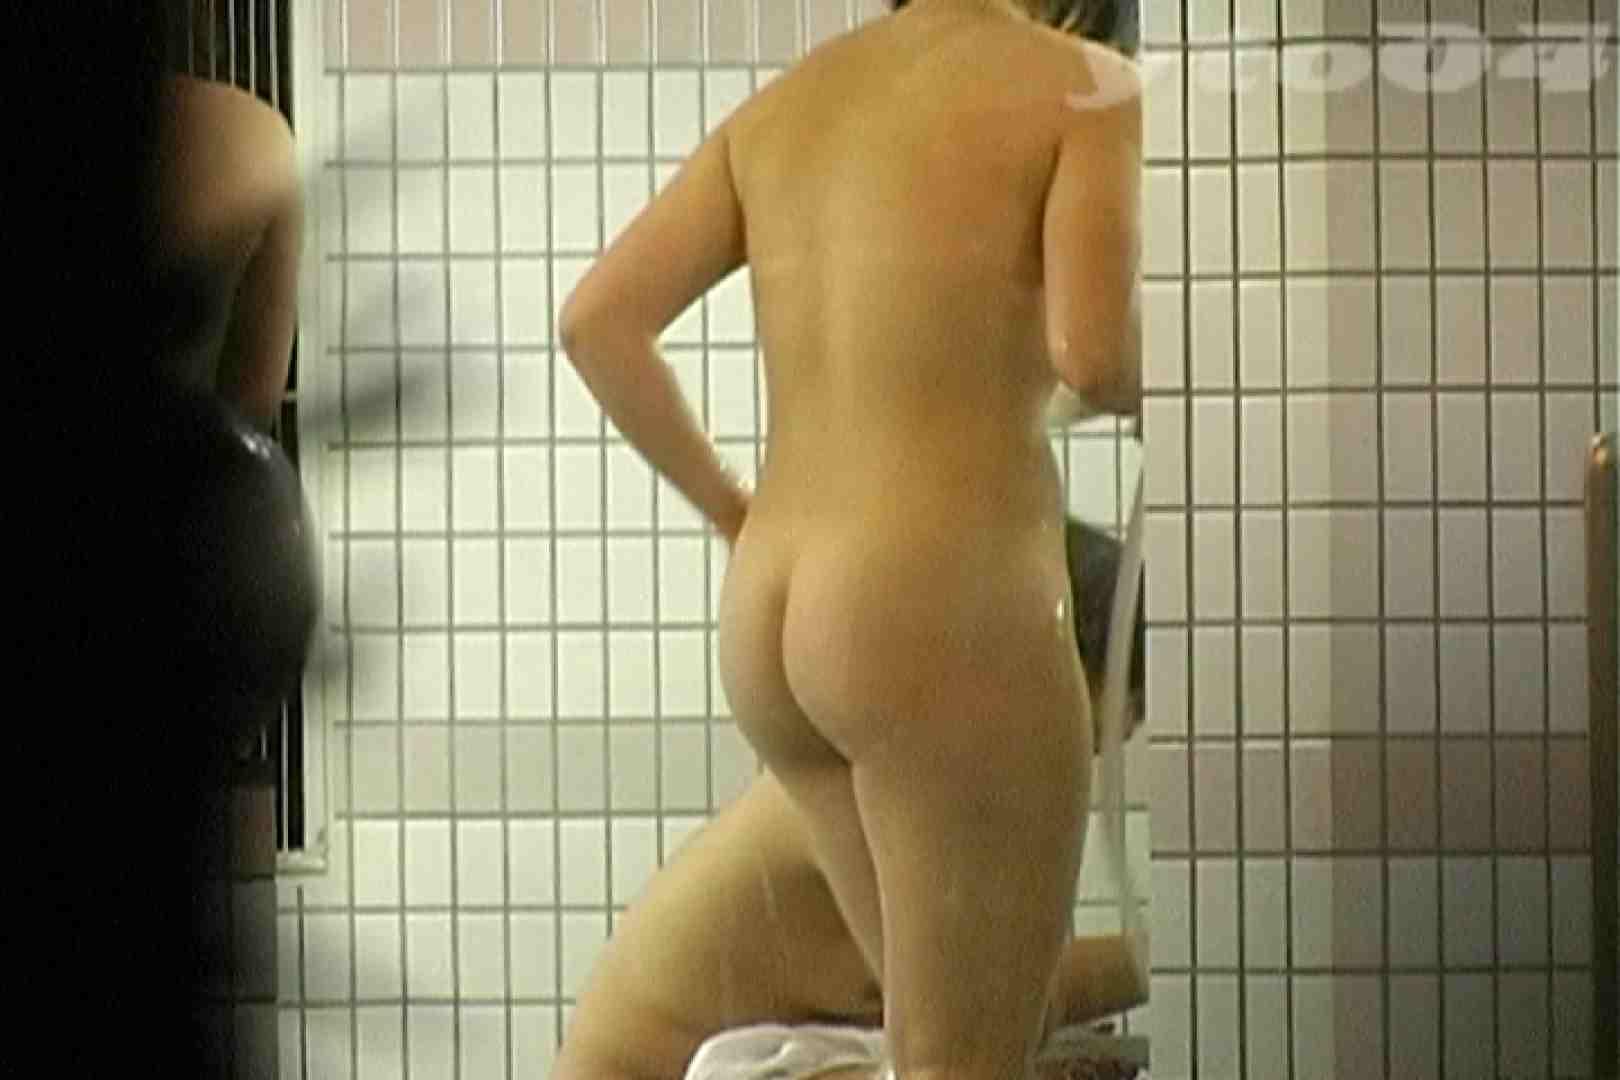 ▲復活限定▲合宿ホテル女風呂盗撮 Vol.24 名作  55pic 54